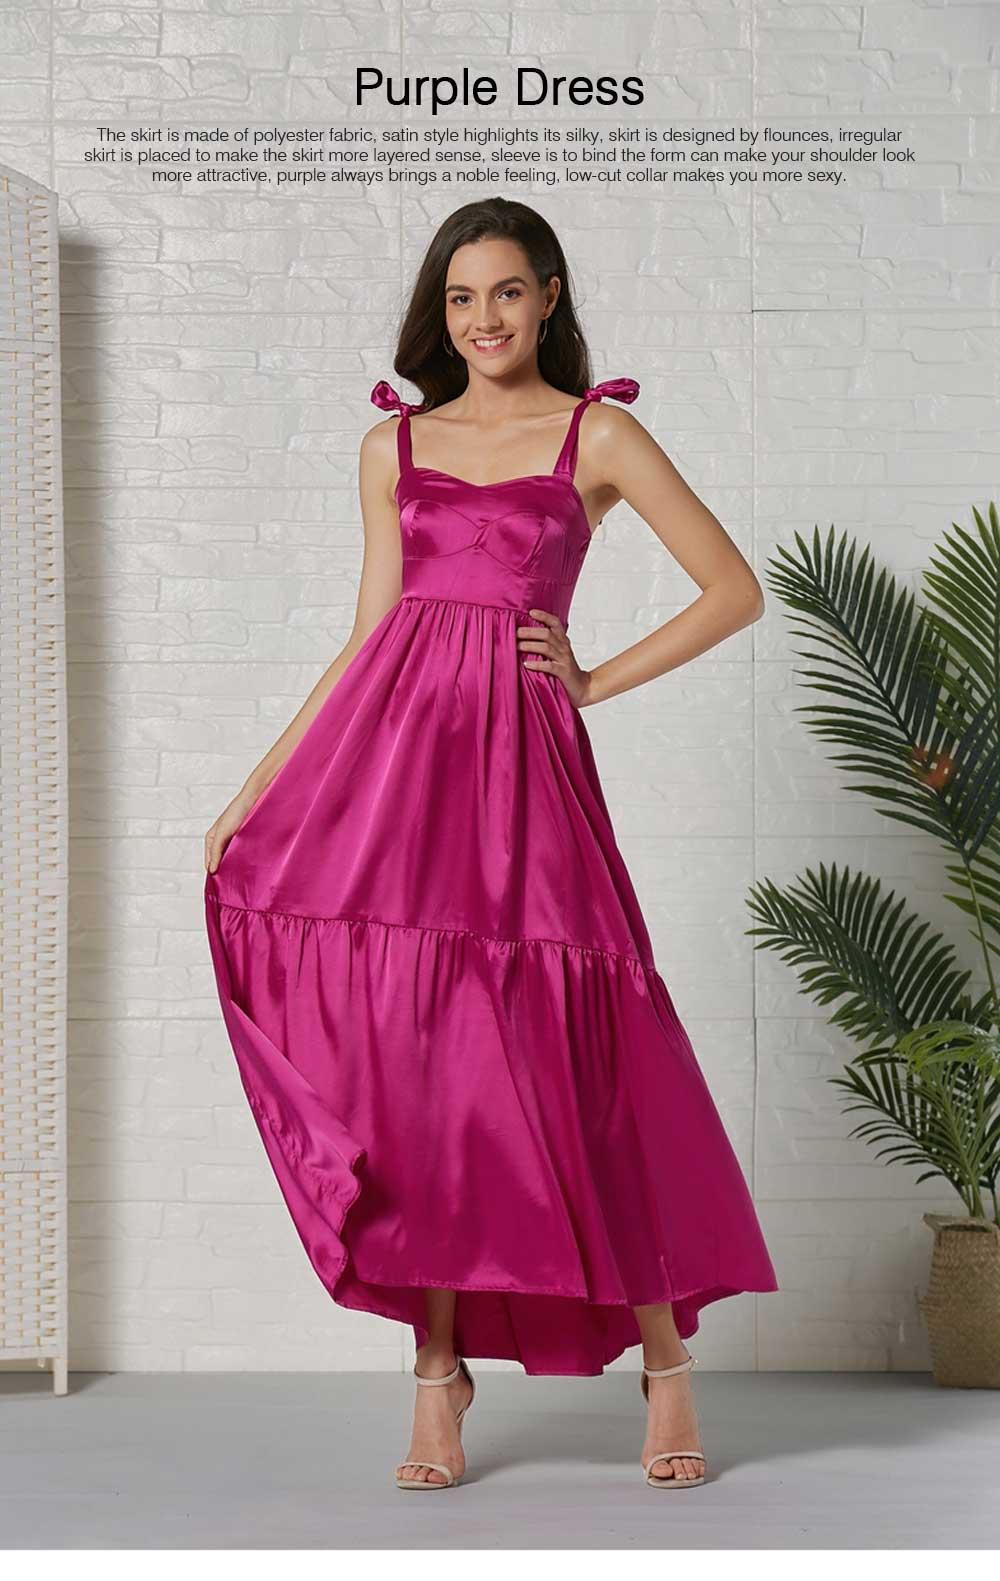 Lady Bohemian Dress Satin Flapper Hem Petticoat Binding Non-sleeve Long Purple Skirt Spring Summer for Women 0